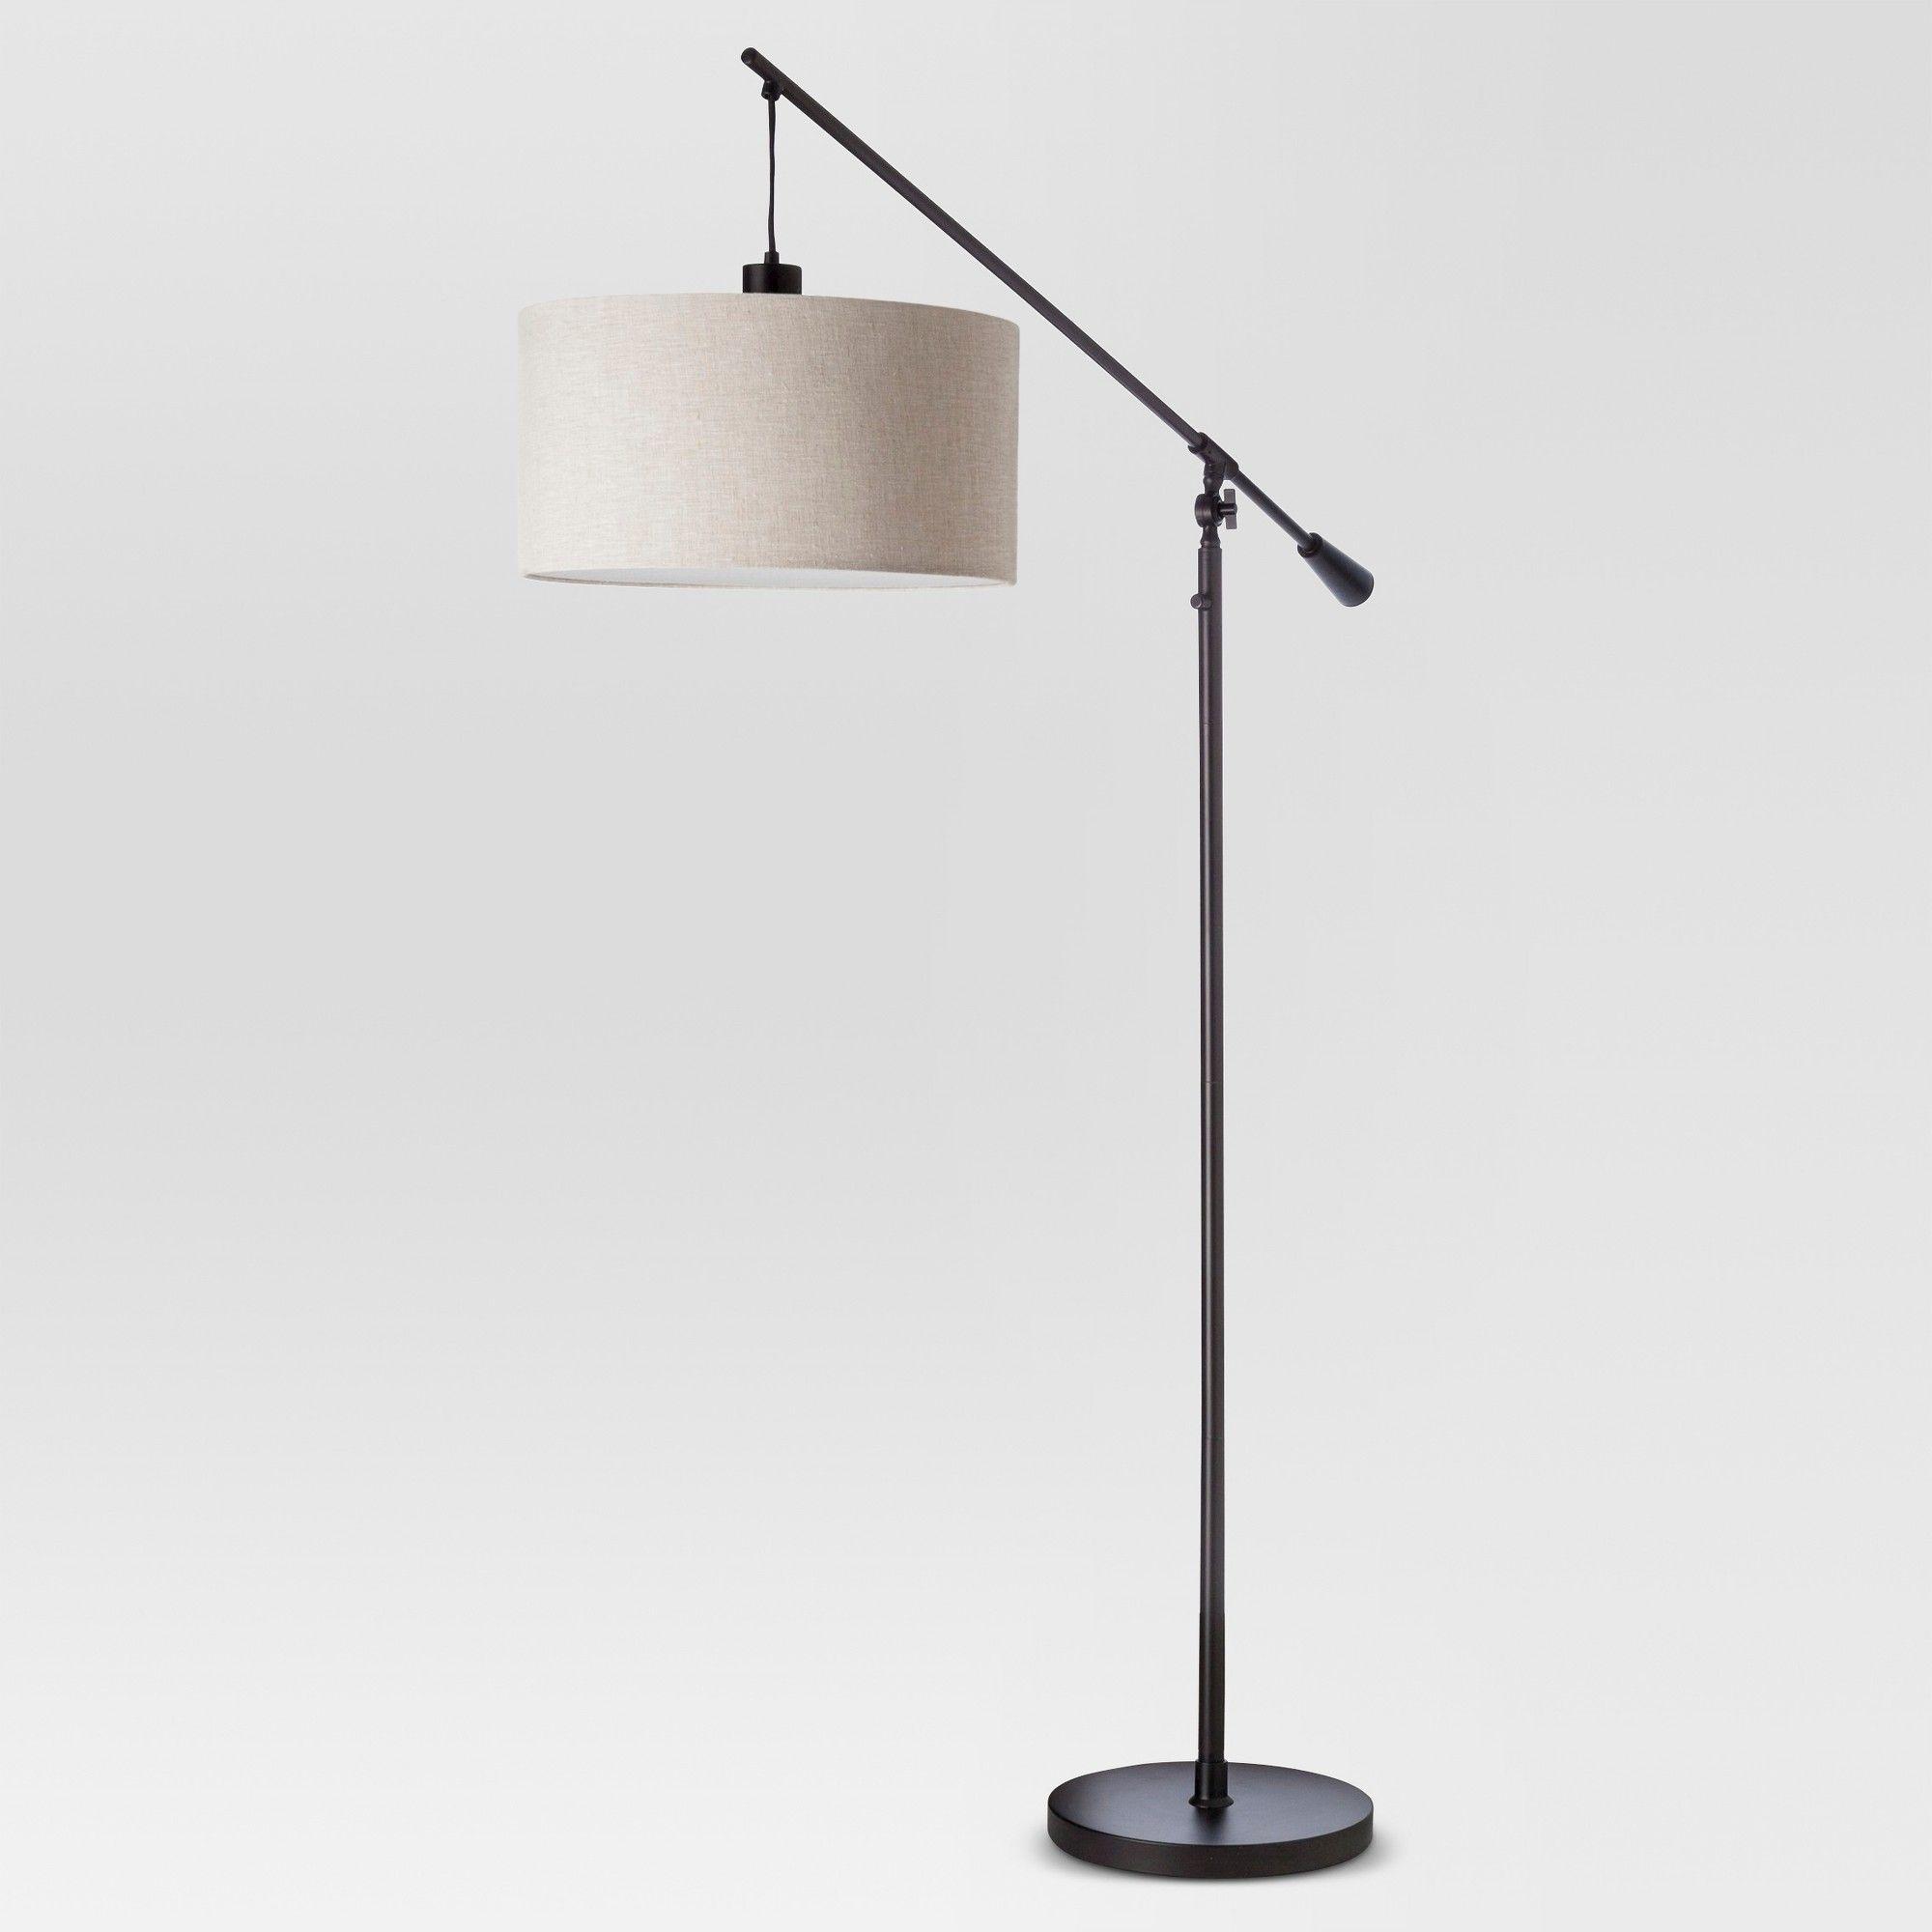 Cantilever Drop Pendant Floor Lamp Antique Bronze Threshold Black Floor Lamp Floor Lamp Floor Lamps Living Room